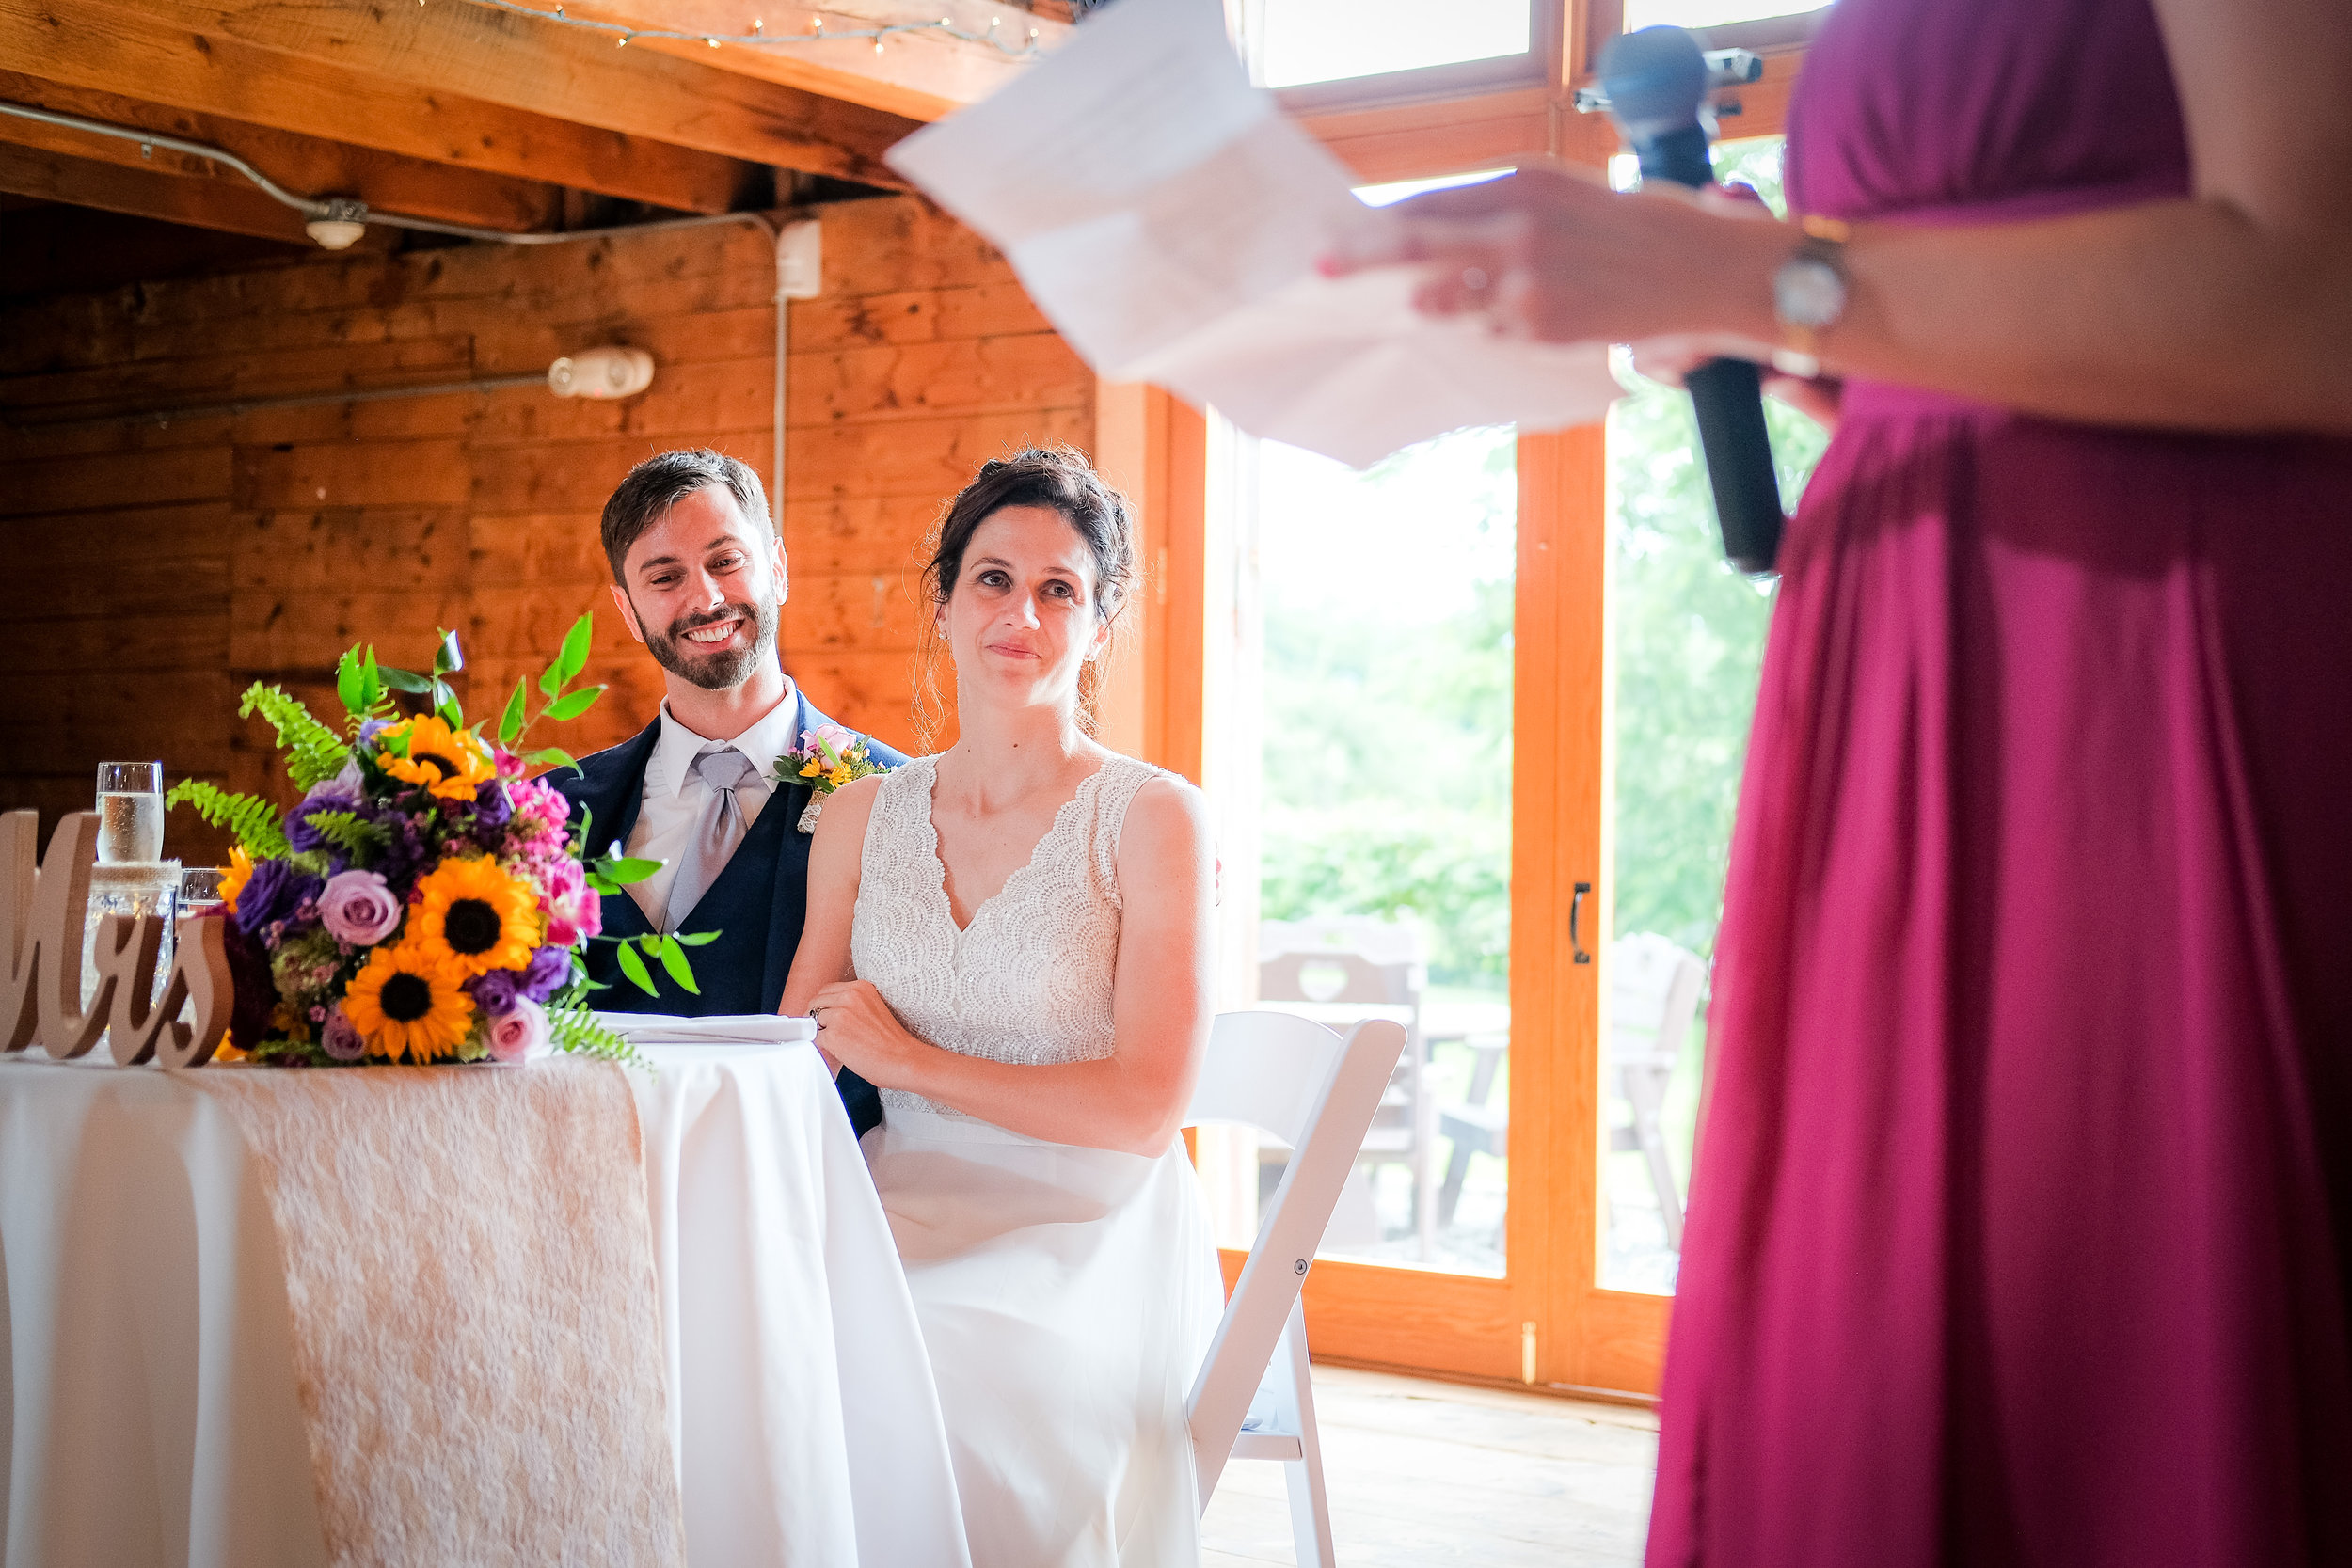 Peabody-Smith-Barn-Wedding-Photography-32.jpg